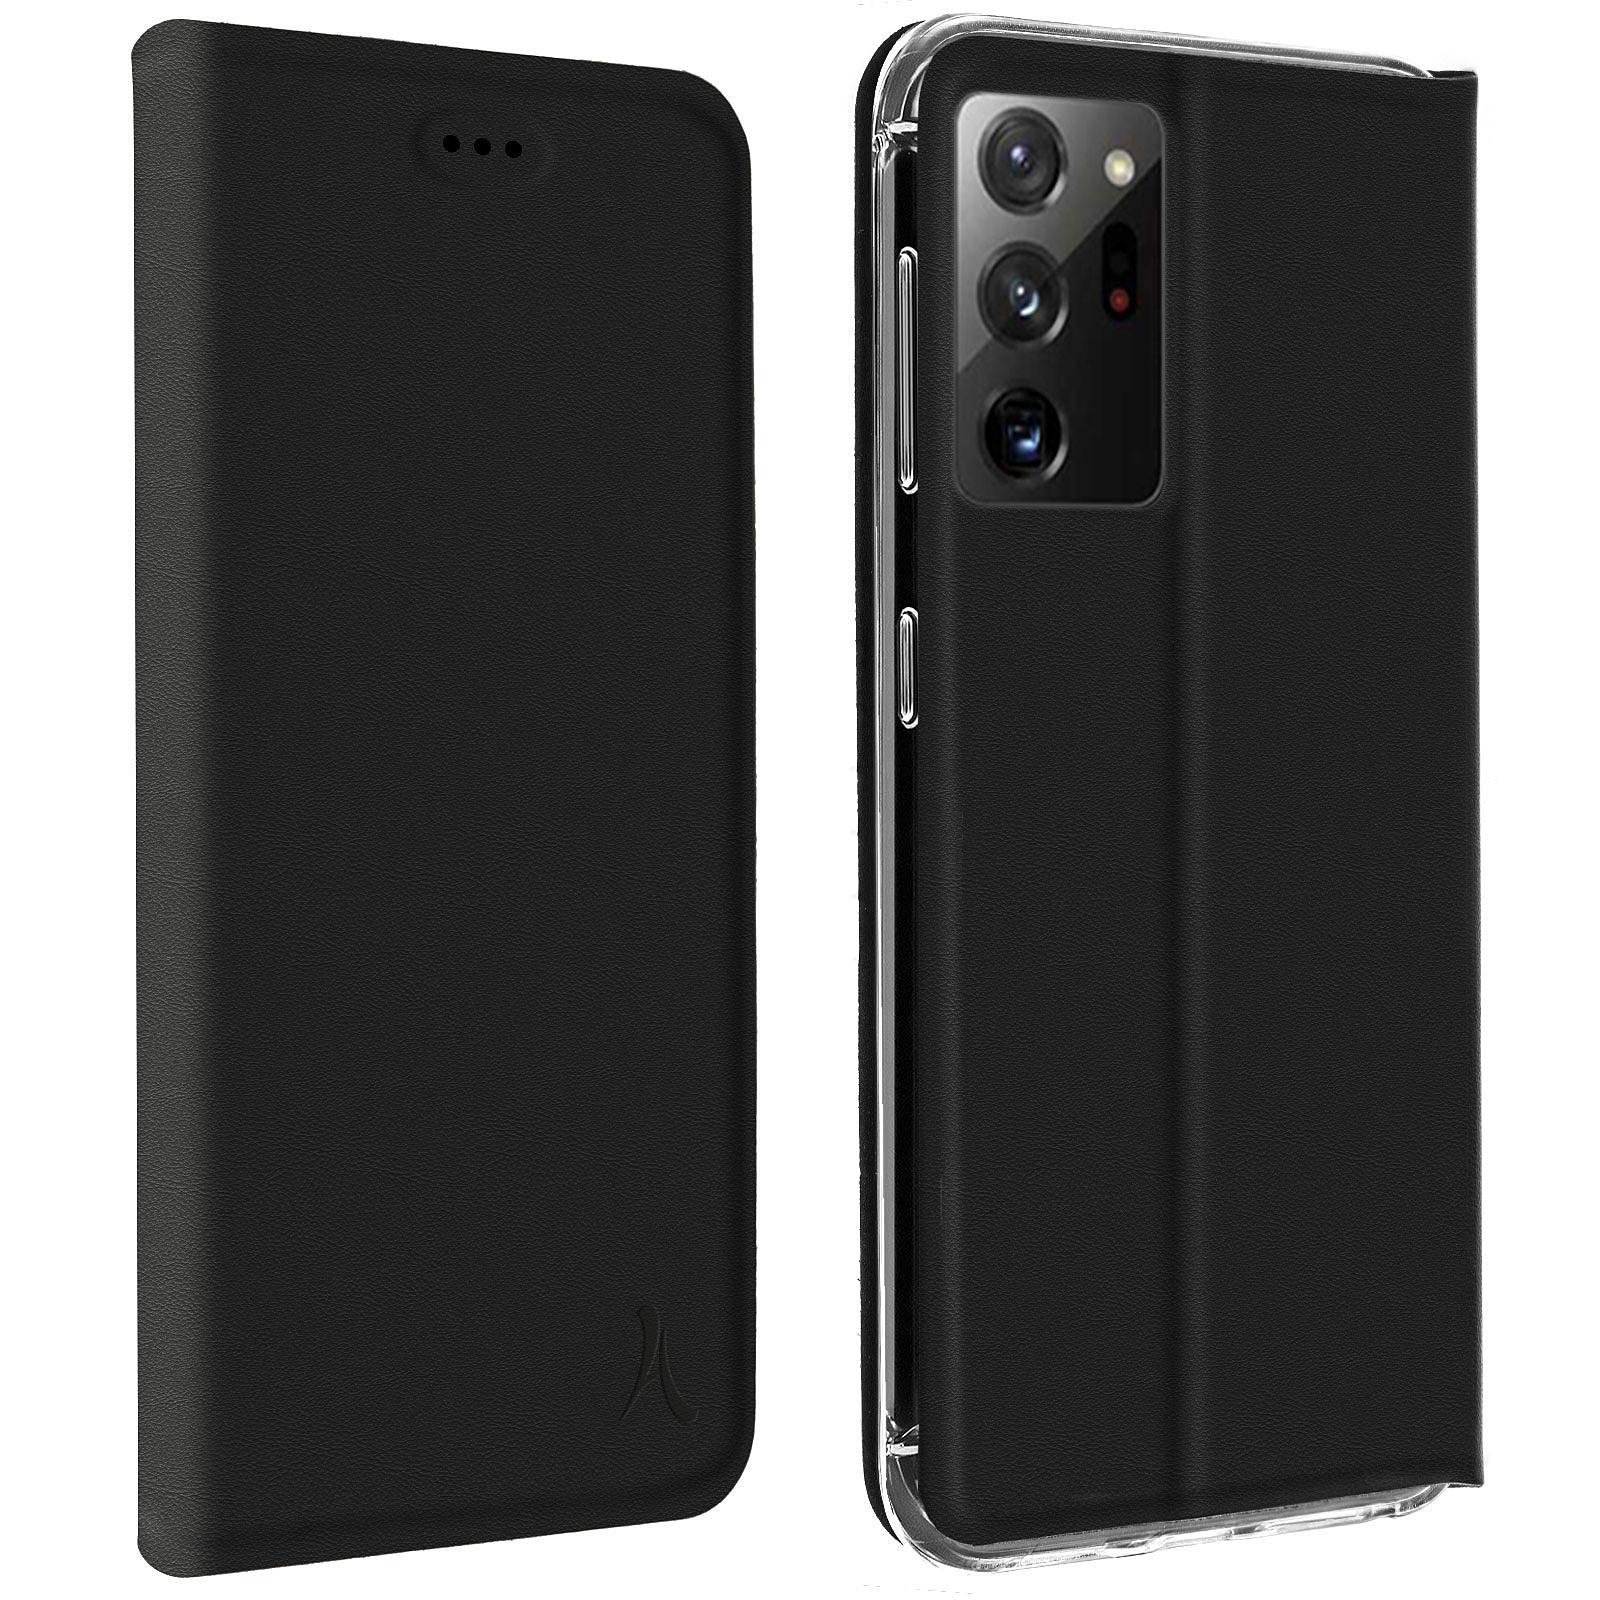 Akashi Etui Folio Porte Carte Noir Samsung Galaxy Note 20 Ultra